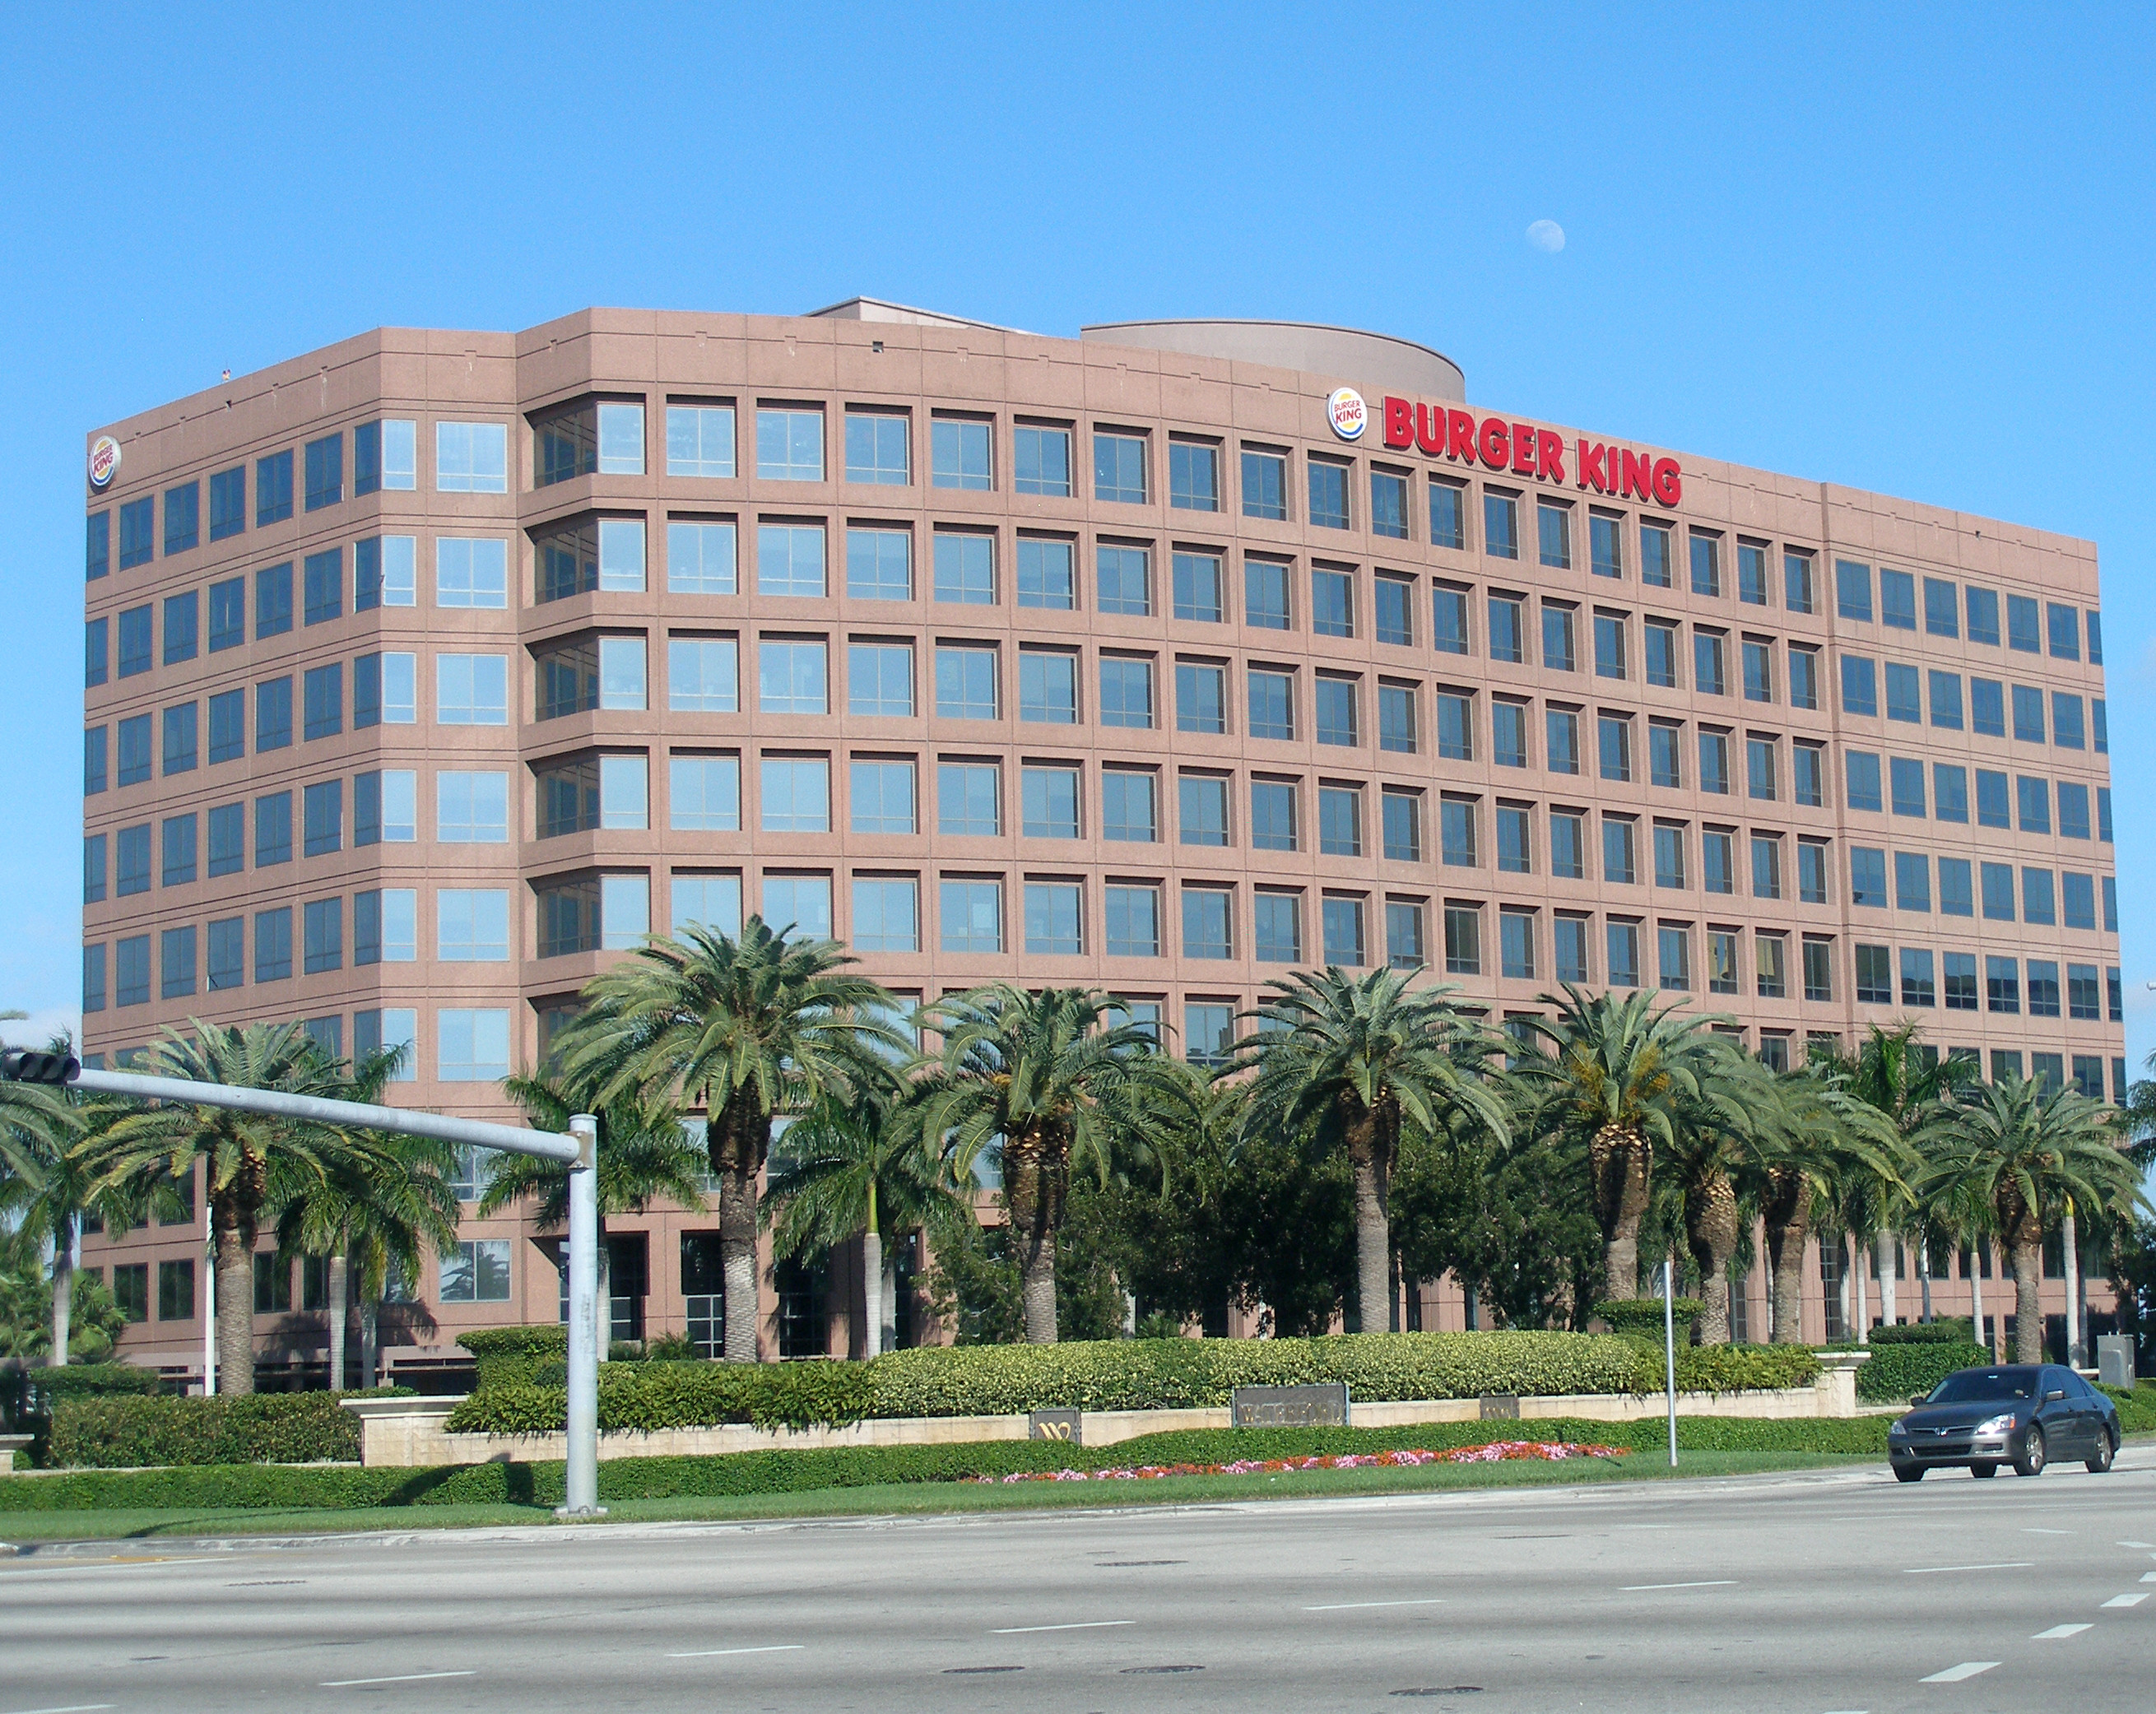 File burger king interior cork ireland 2012 jpg wikimedia commons - Burger King S Corporate Headquarters